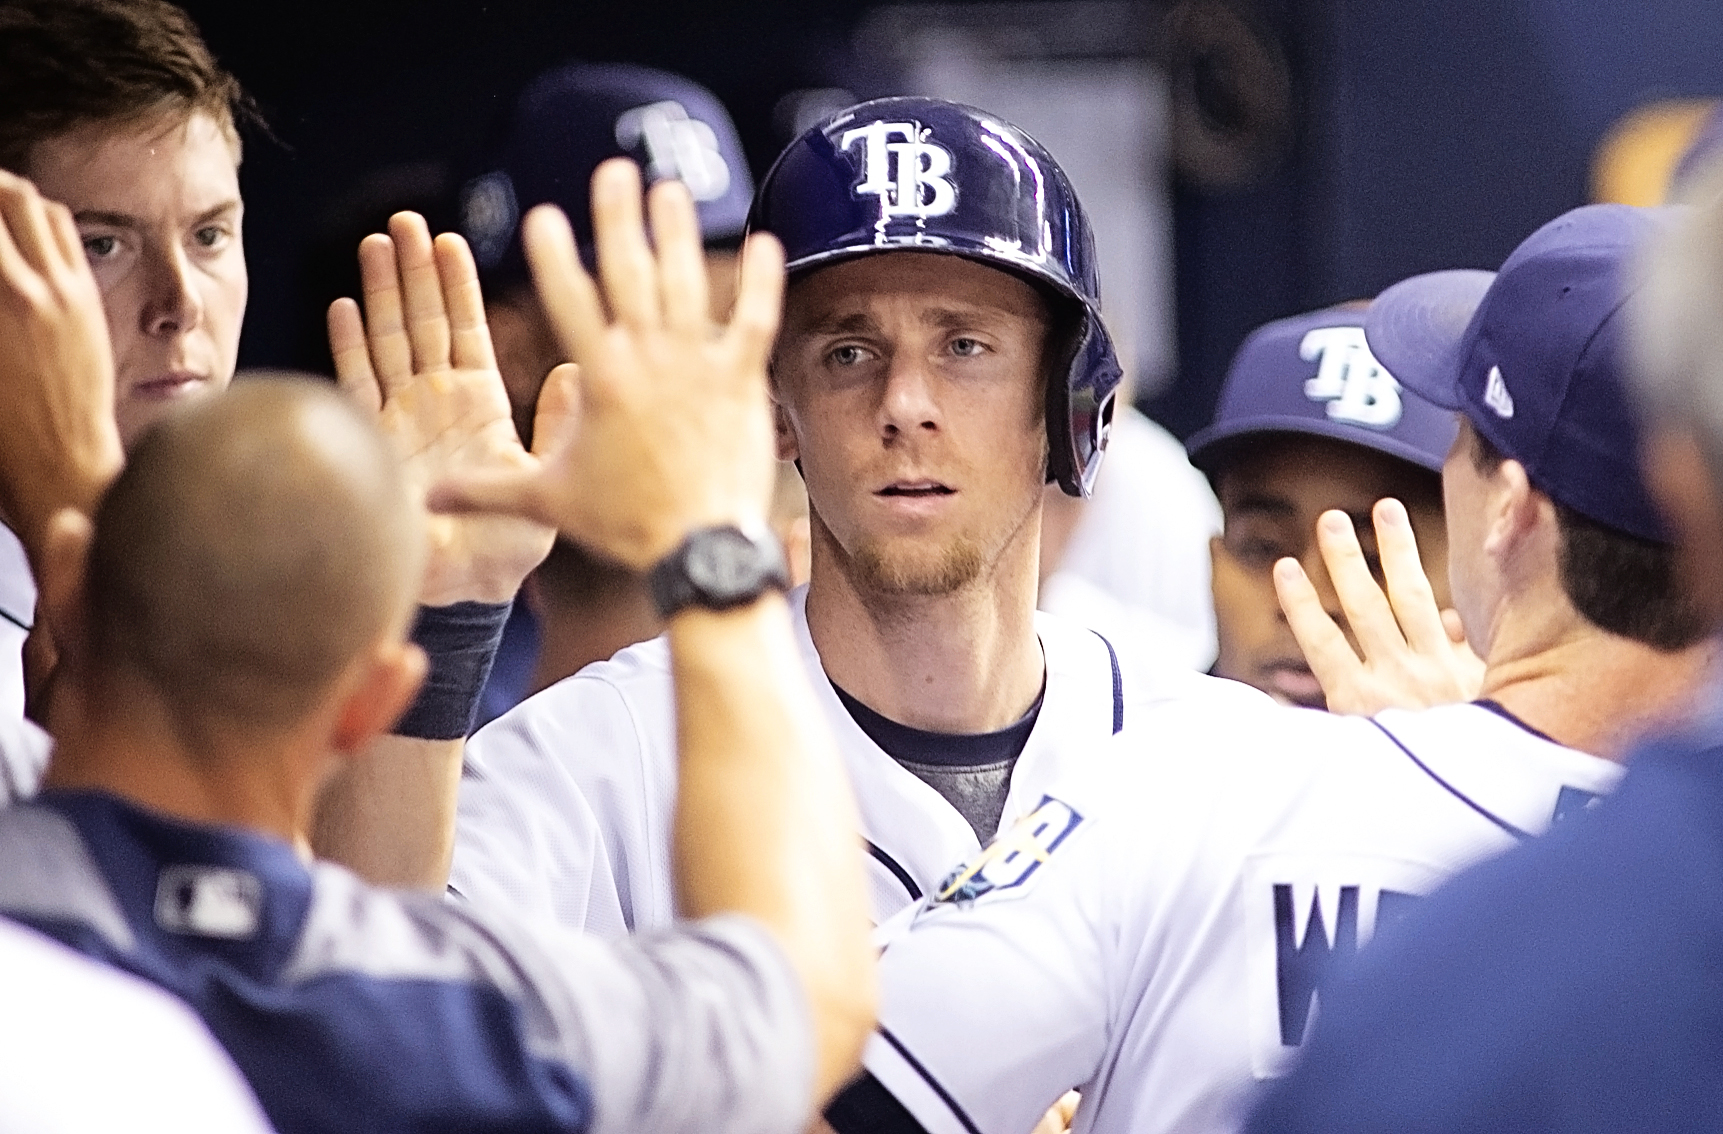 Duffy's home run led to Rays' only score./CARMEN MANDATO